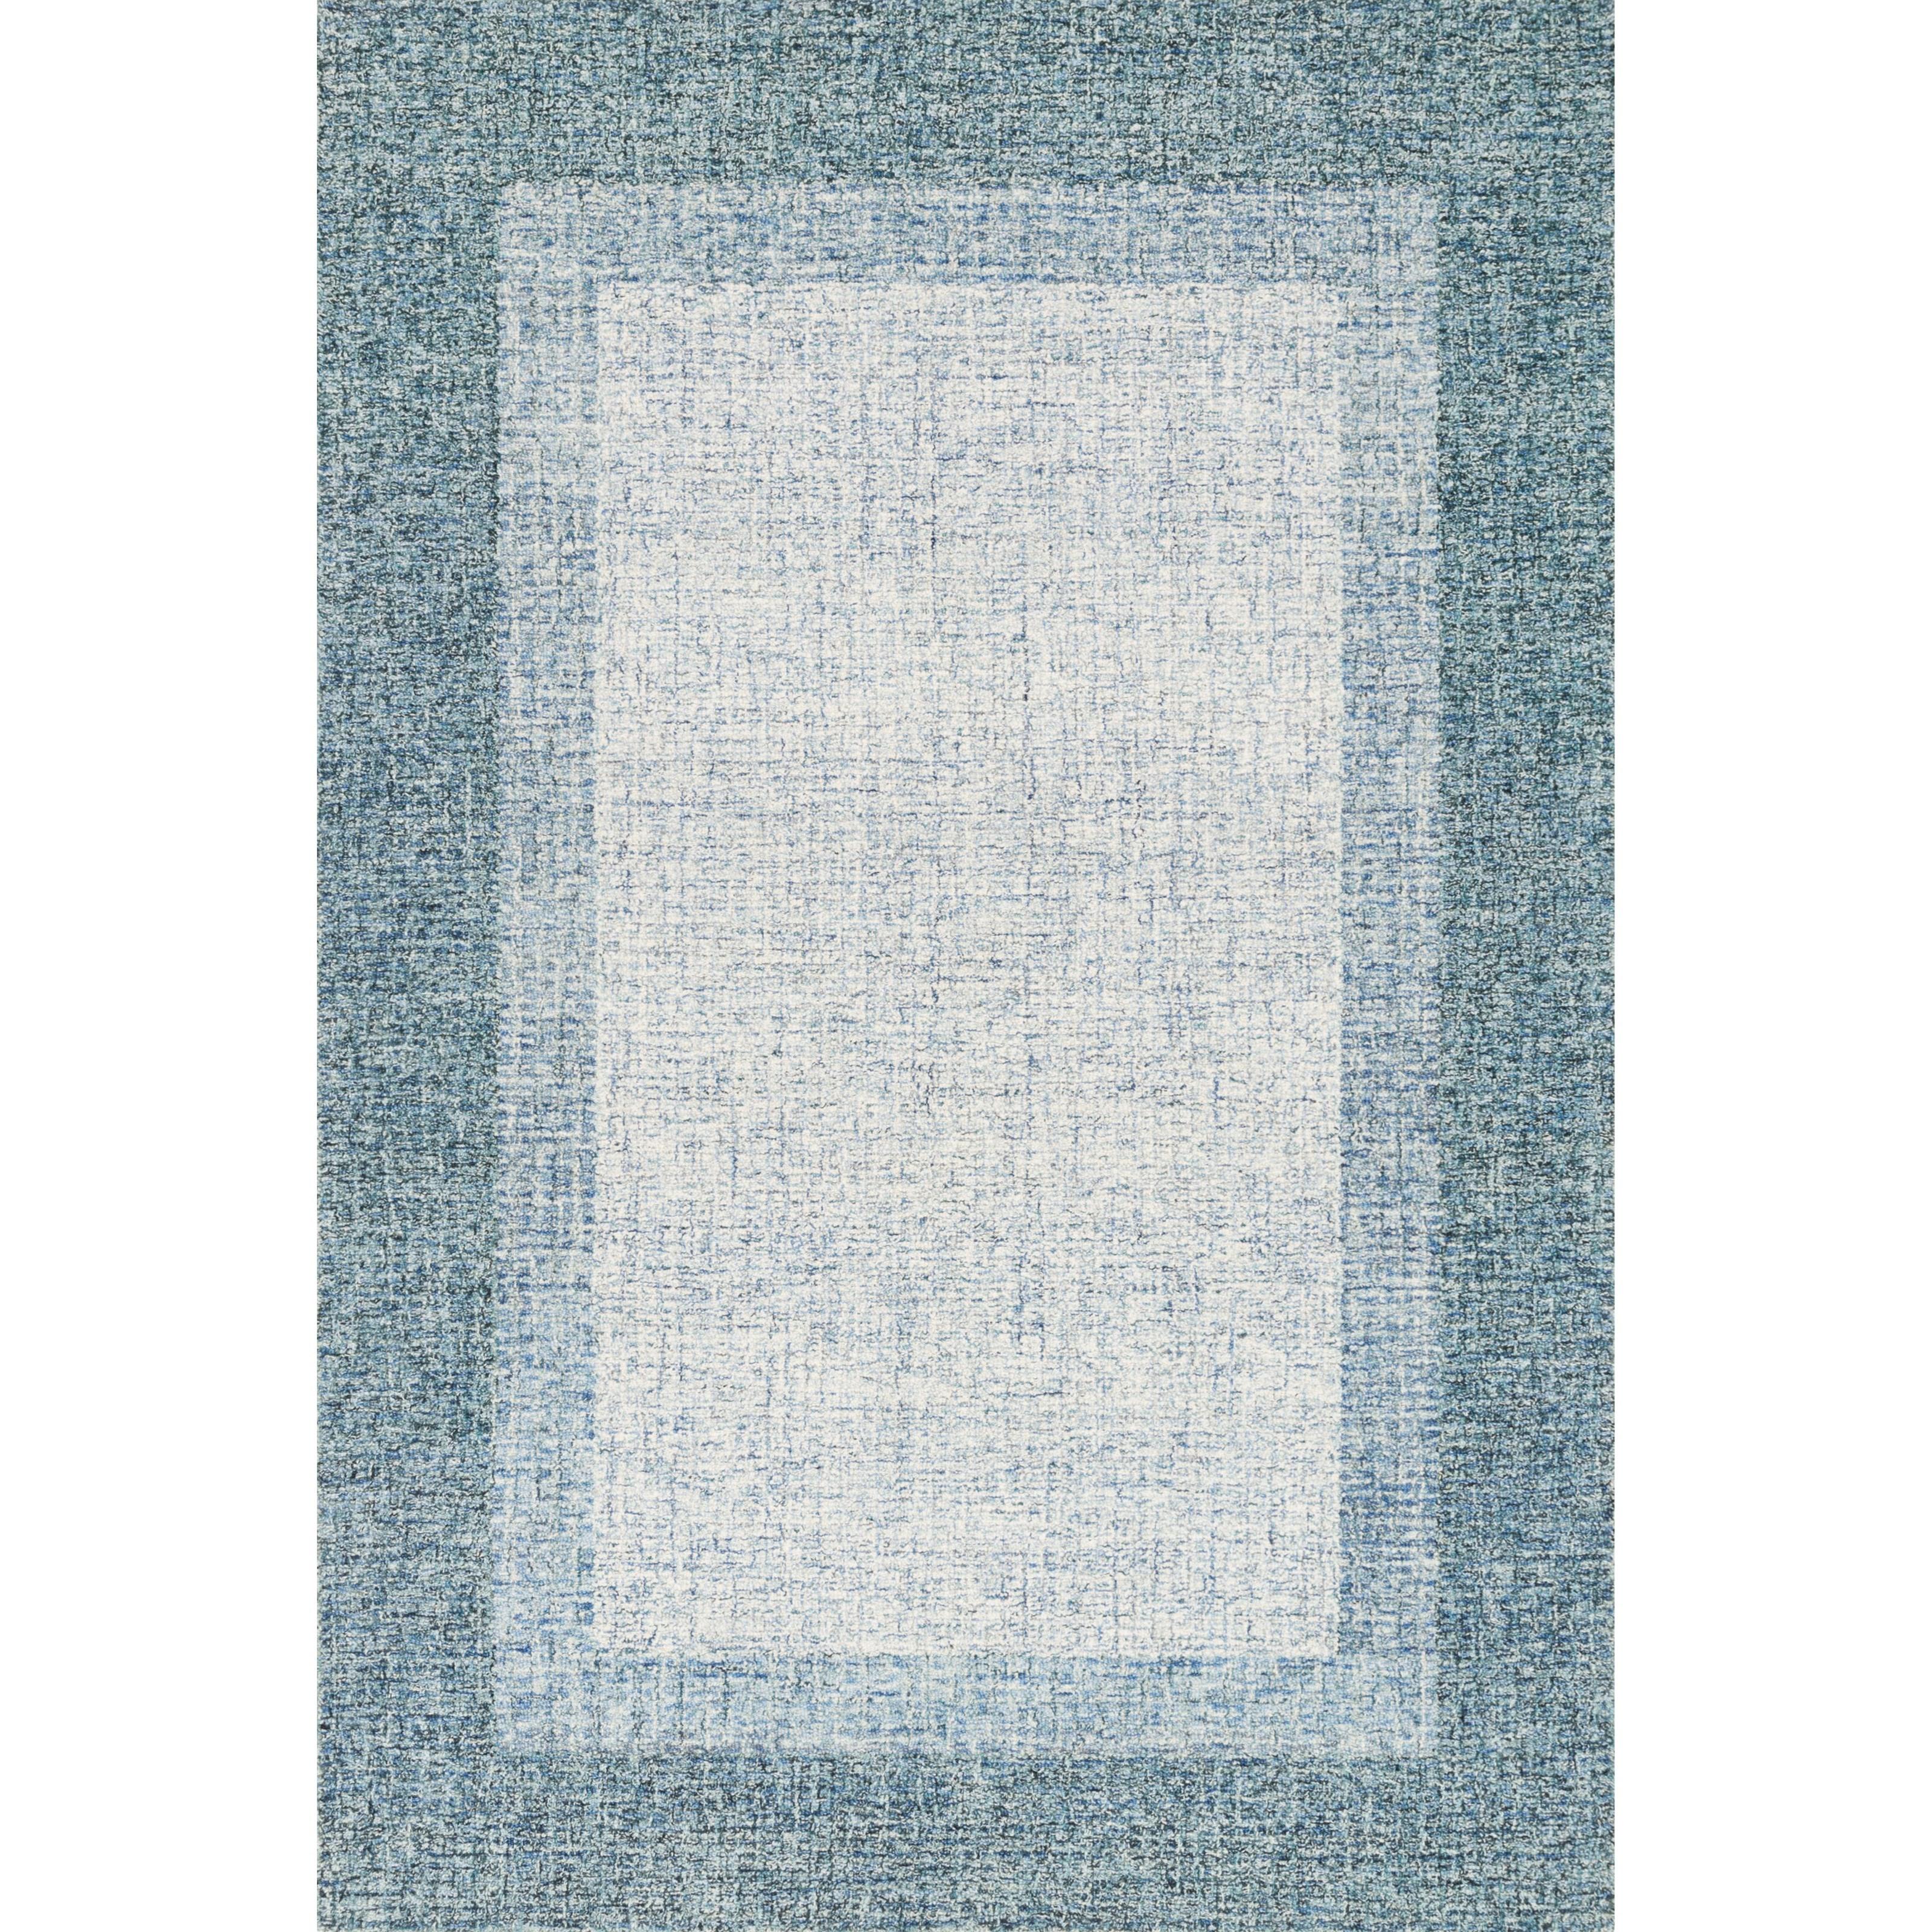 "Rosina 2'6"" x 7'6"" Aqua Rug by Loloi Rugs at Sprintz Furniture"